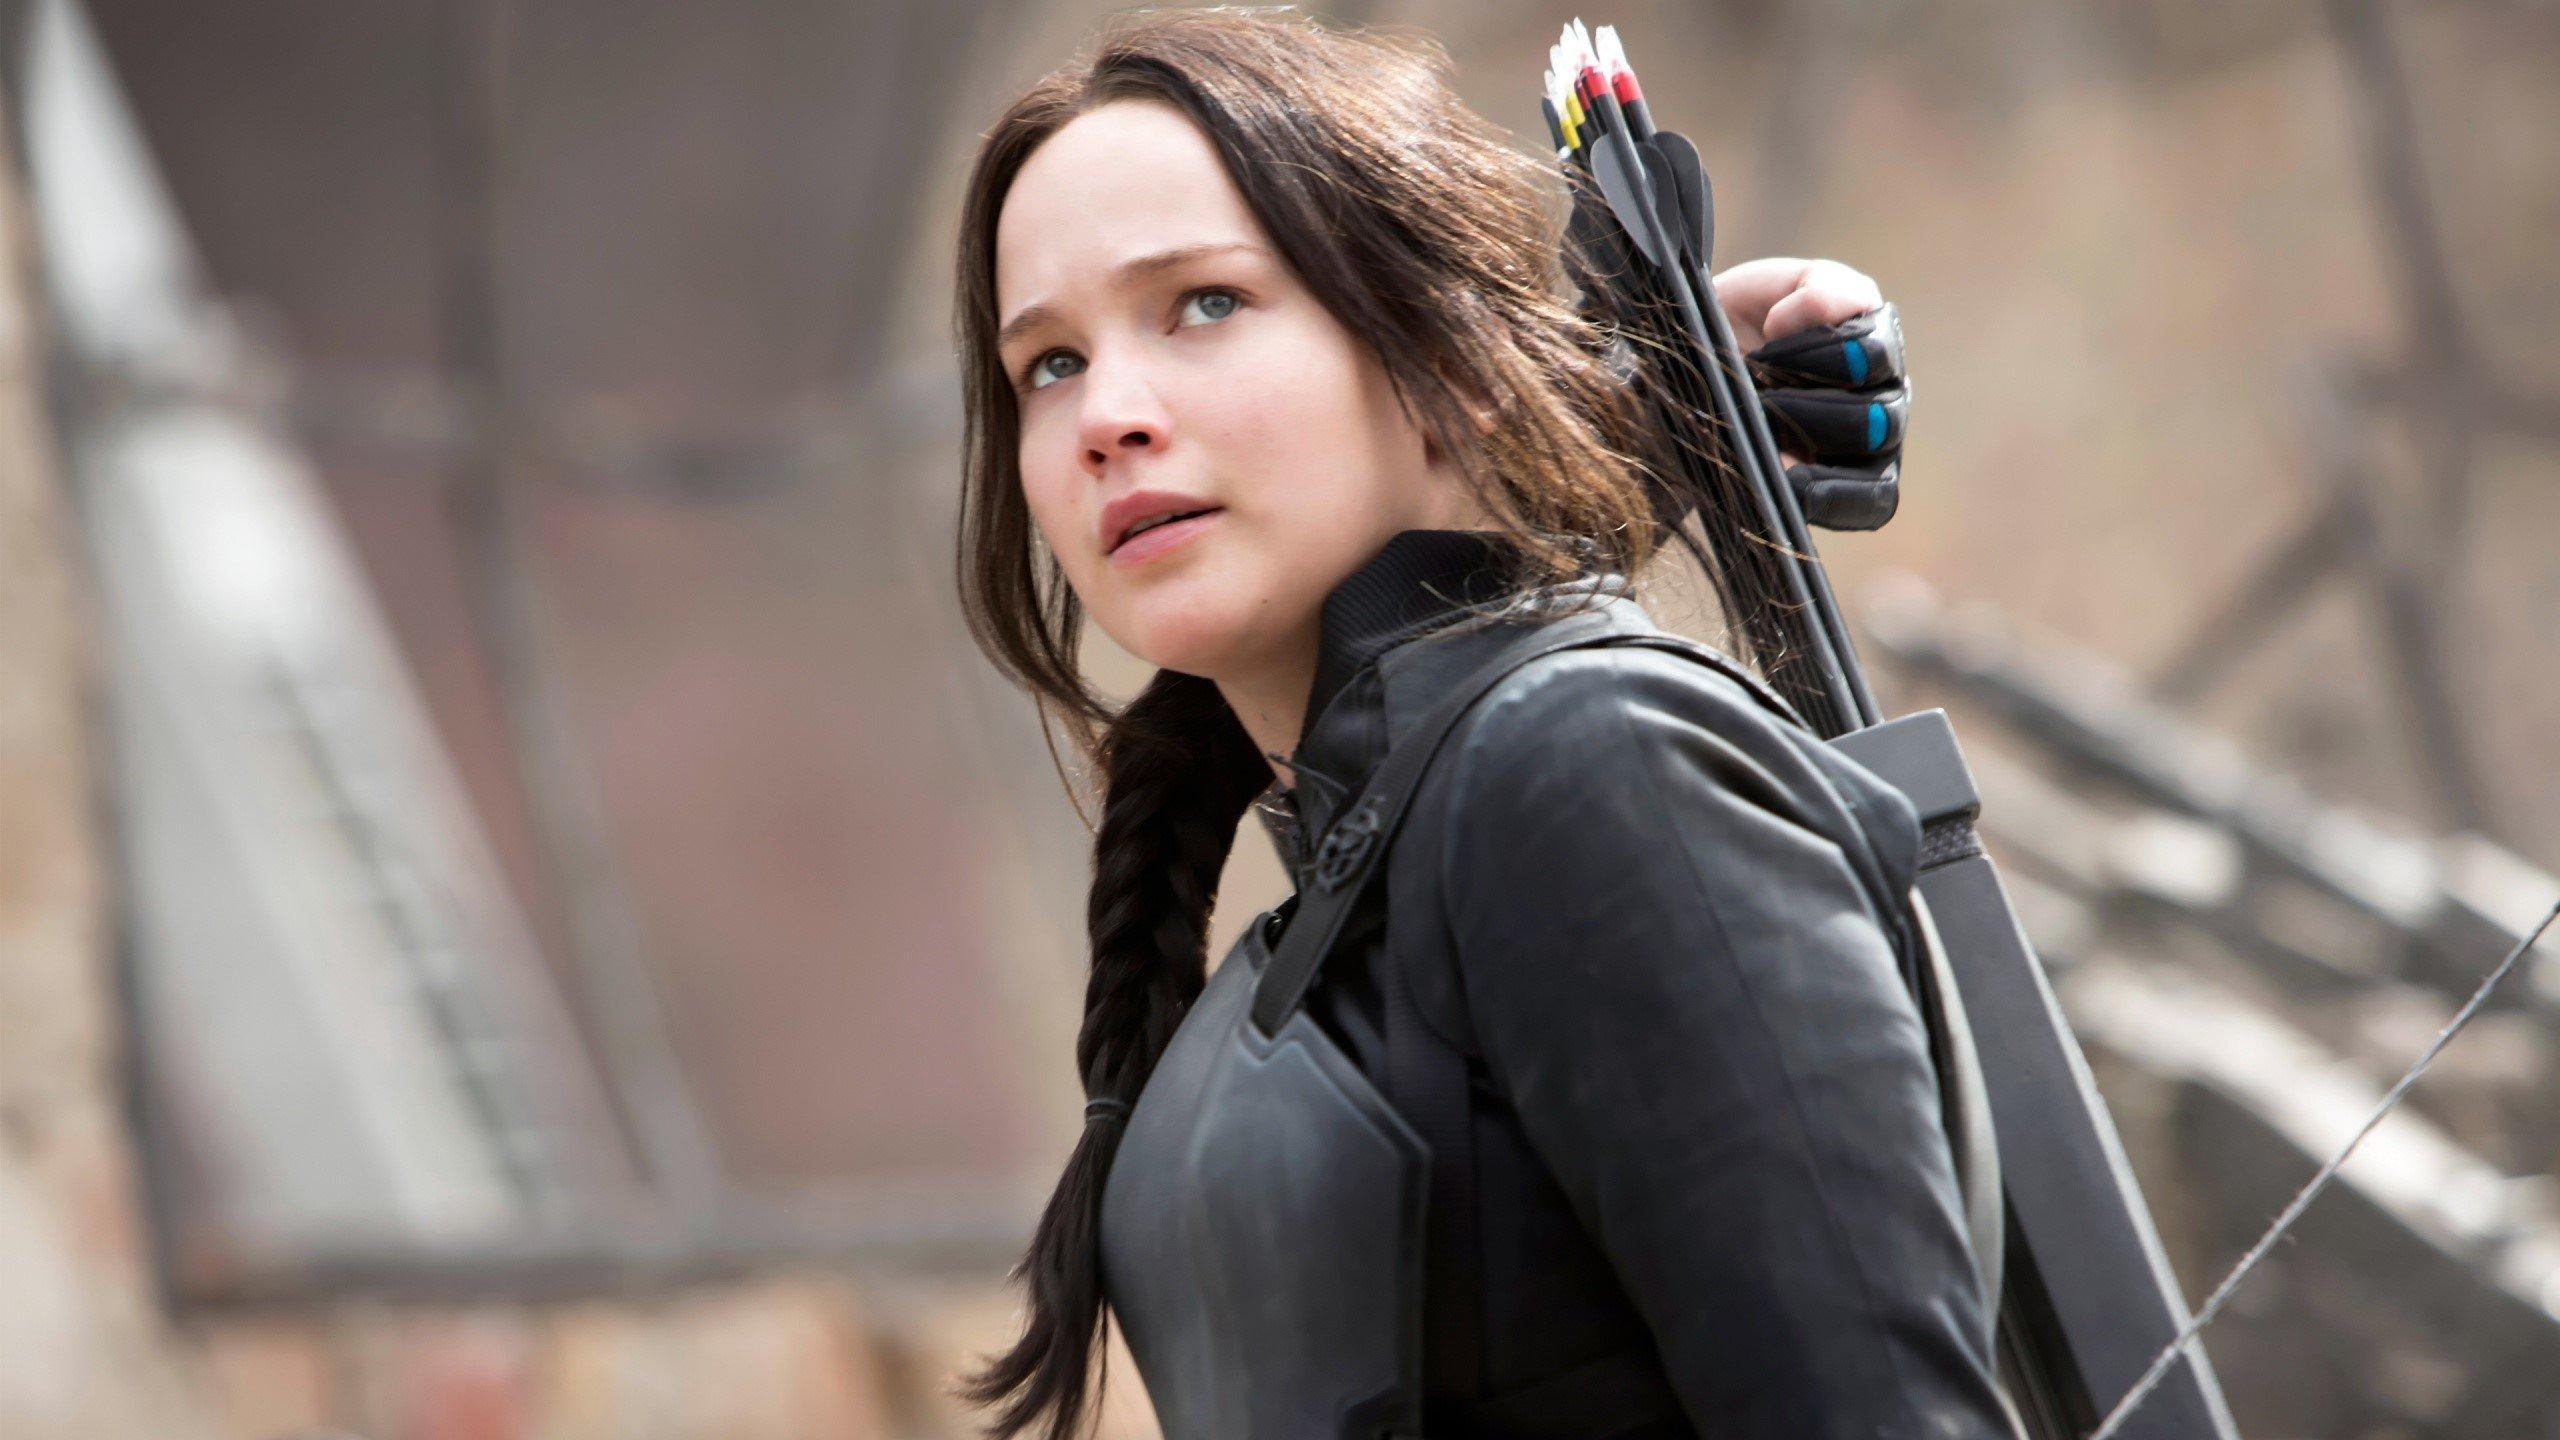 Fondo de pantalla de Jennifer lawrence como Katniss Everdeen Imágenes